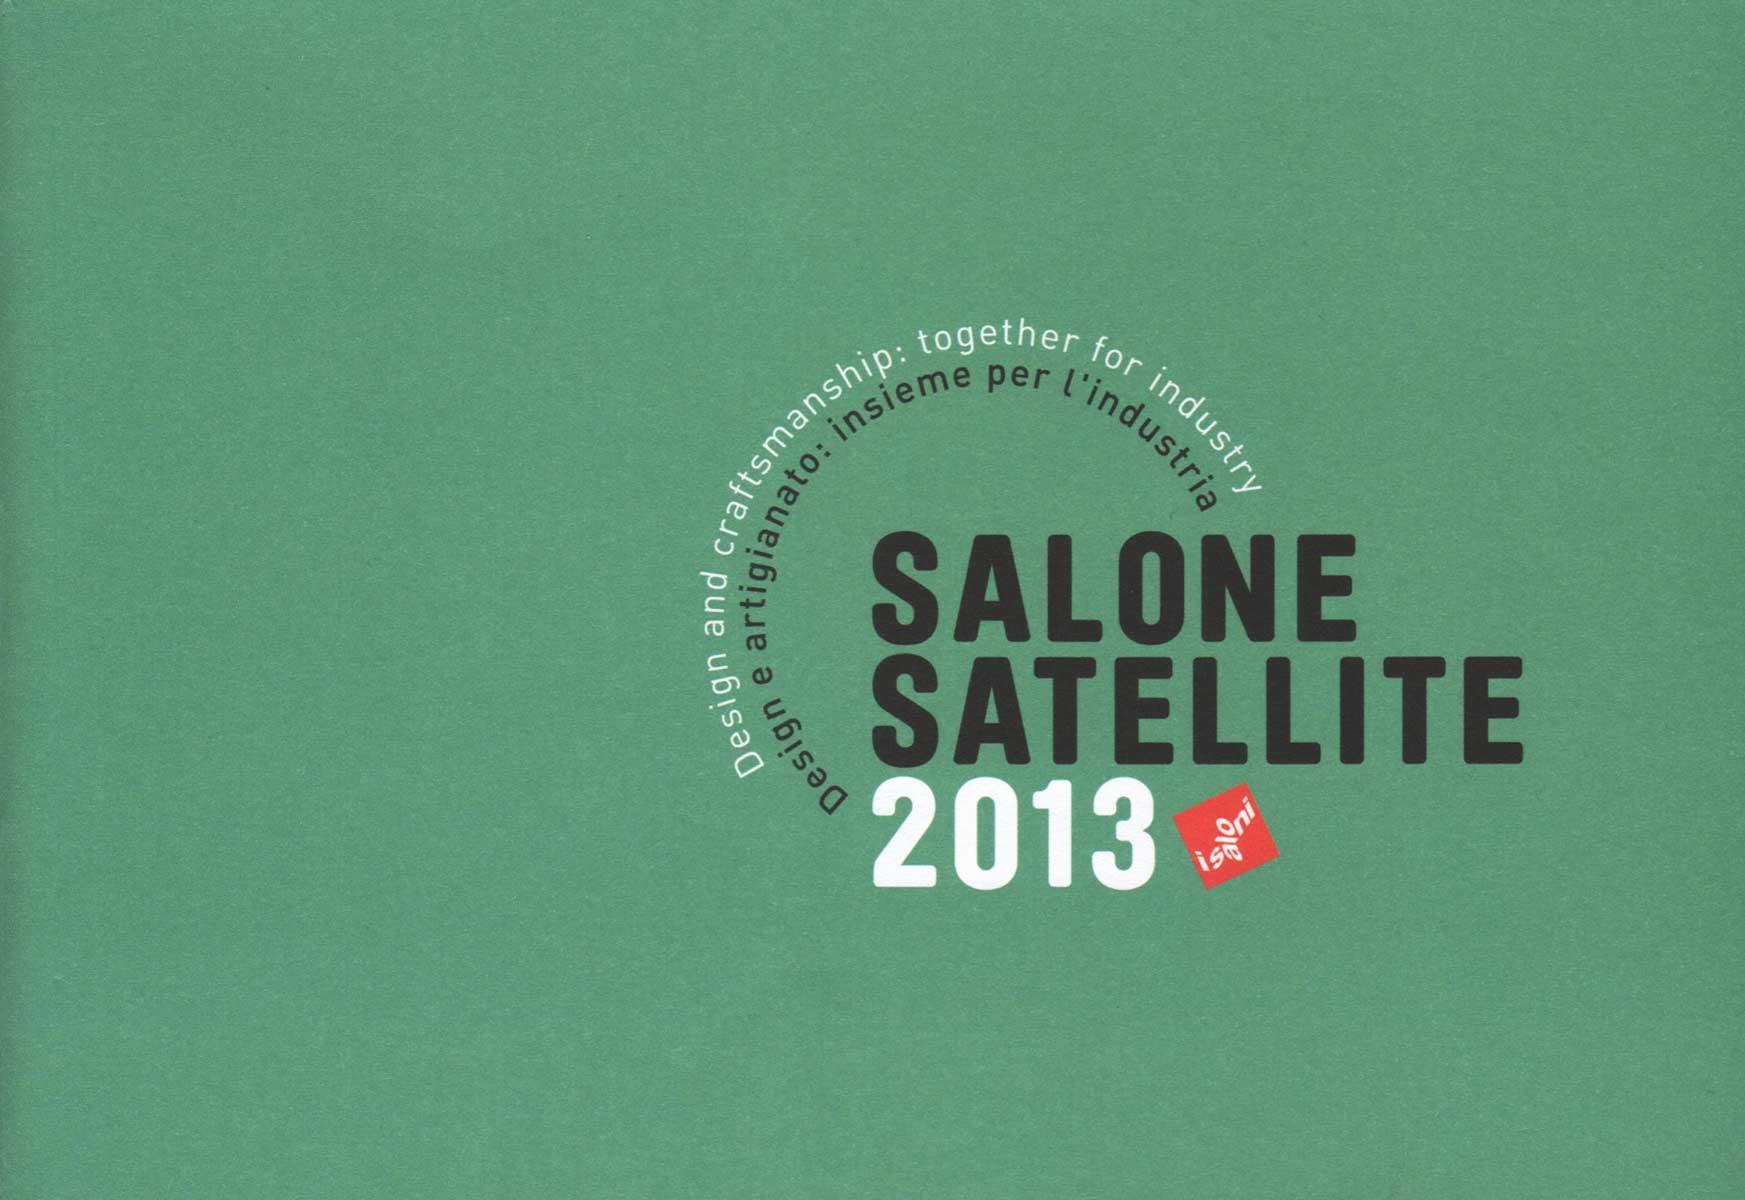 SALONE SATELLITE 04-2013